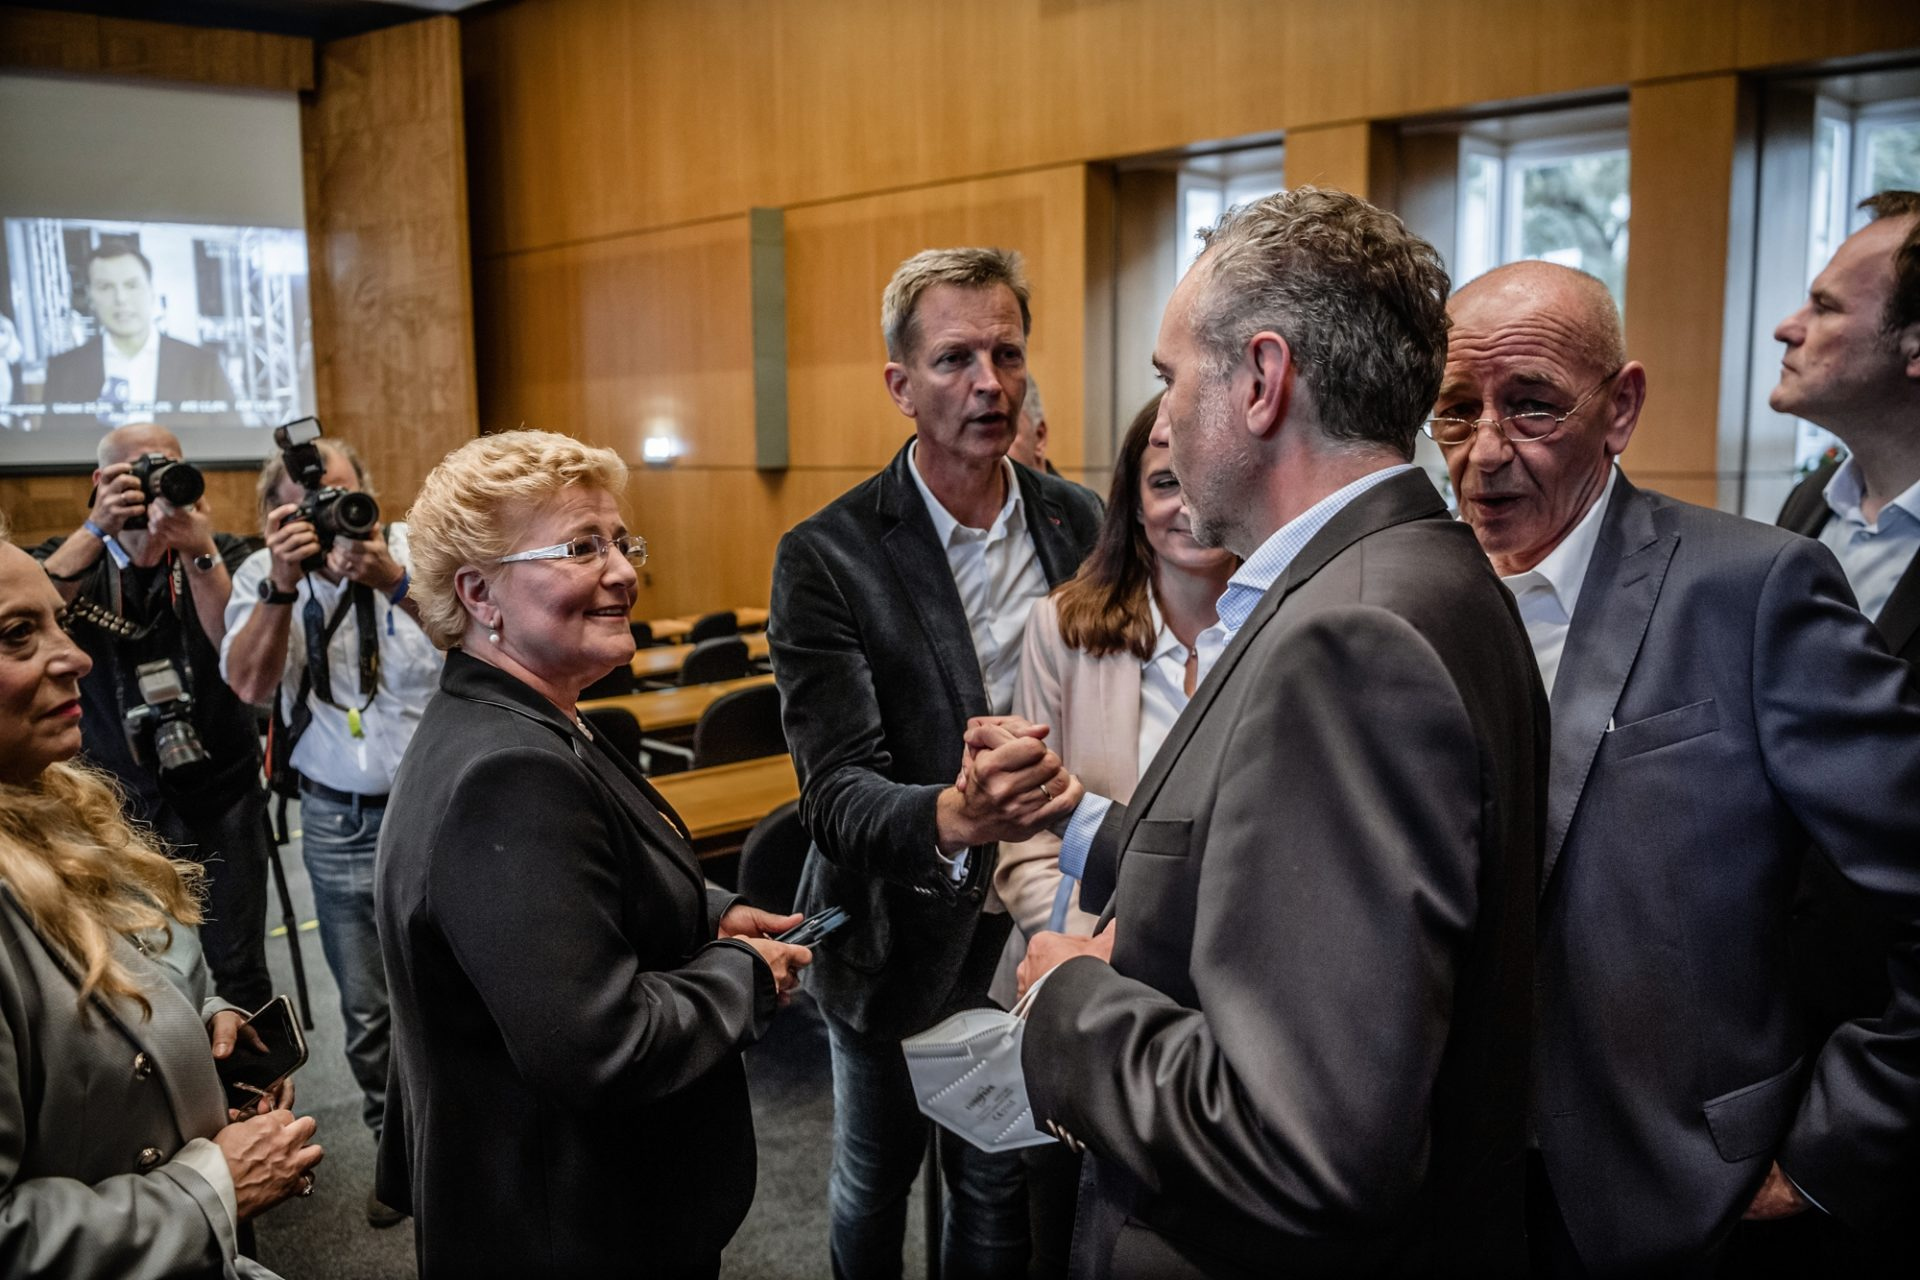 Spitzenvertreter der Düsseldorfer CDU am Wahlabend: Sylvia Pantel, Josef Hinkel, Thomas Jarzombek und Rolf Tups (von links). Foto: Andreas Endermann